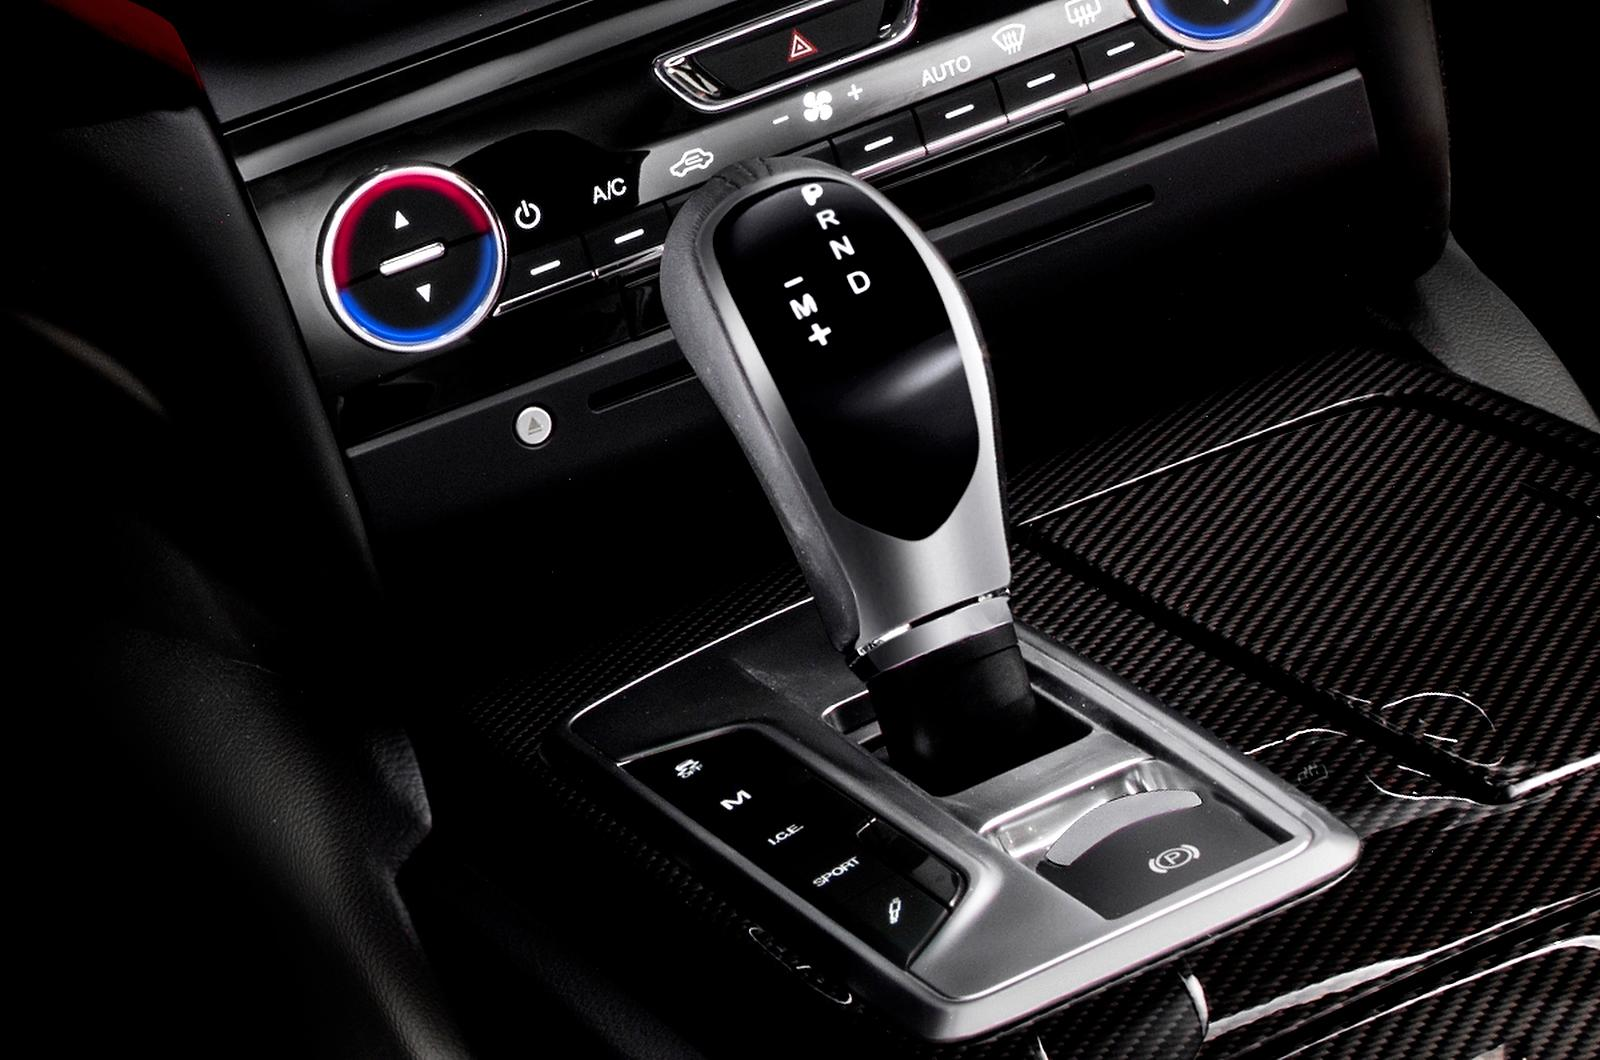 maserati to recall 26,000 cars sold in the usa - autoevolution